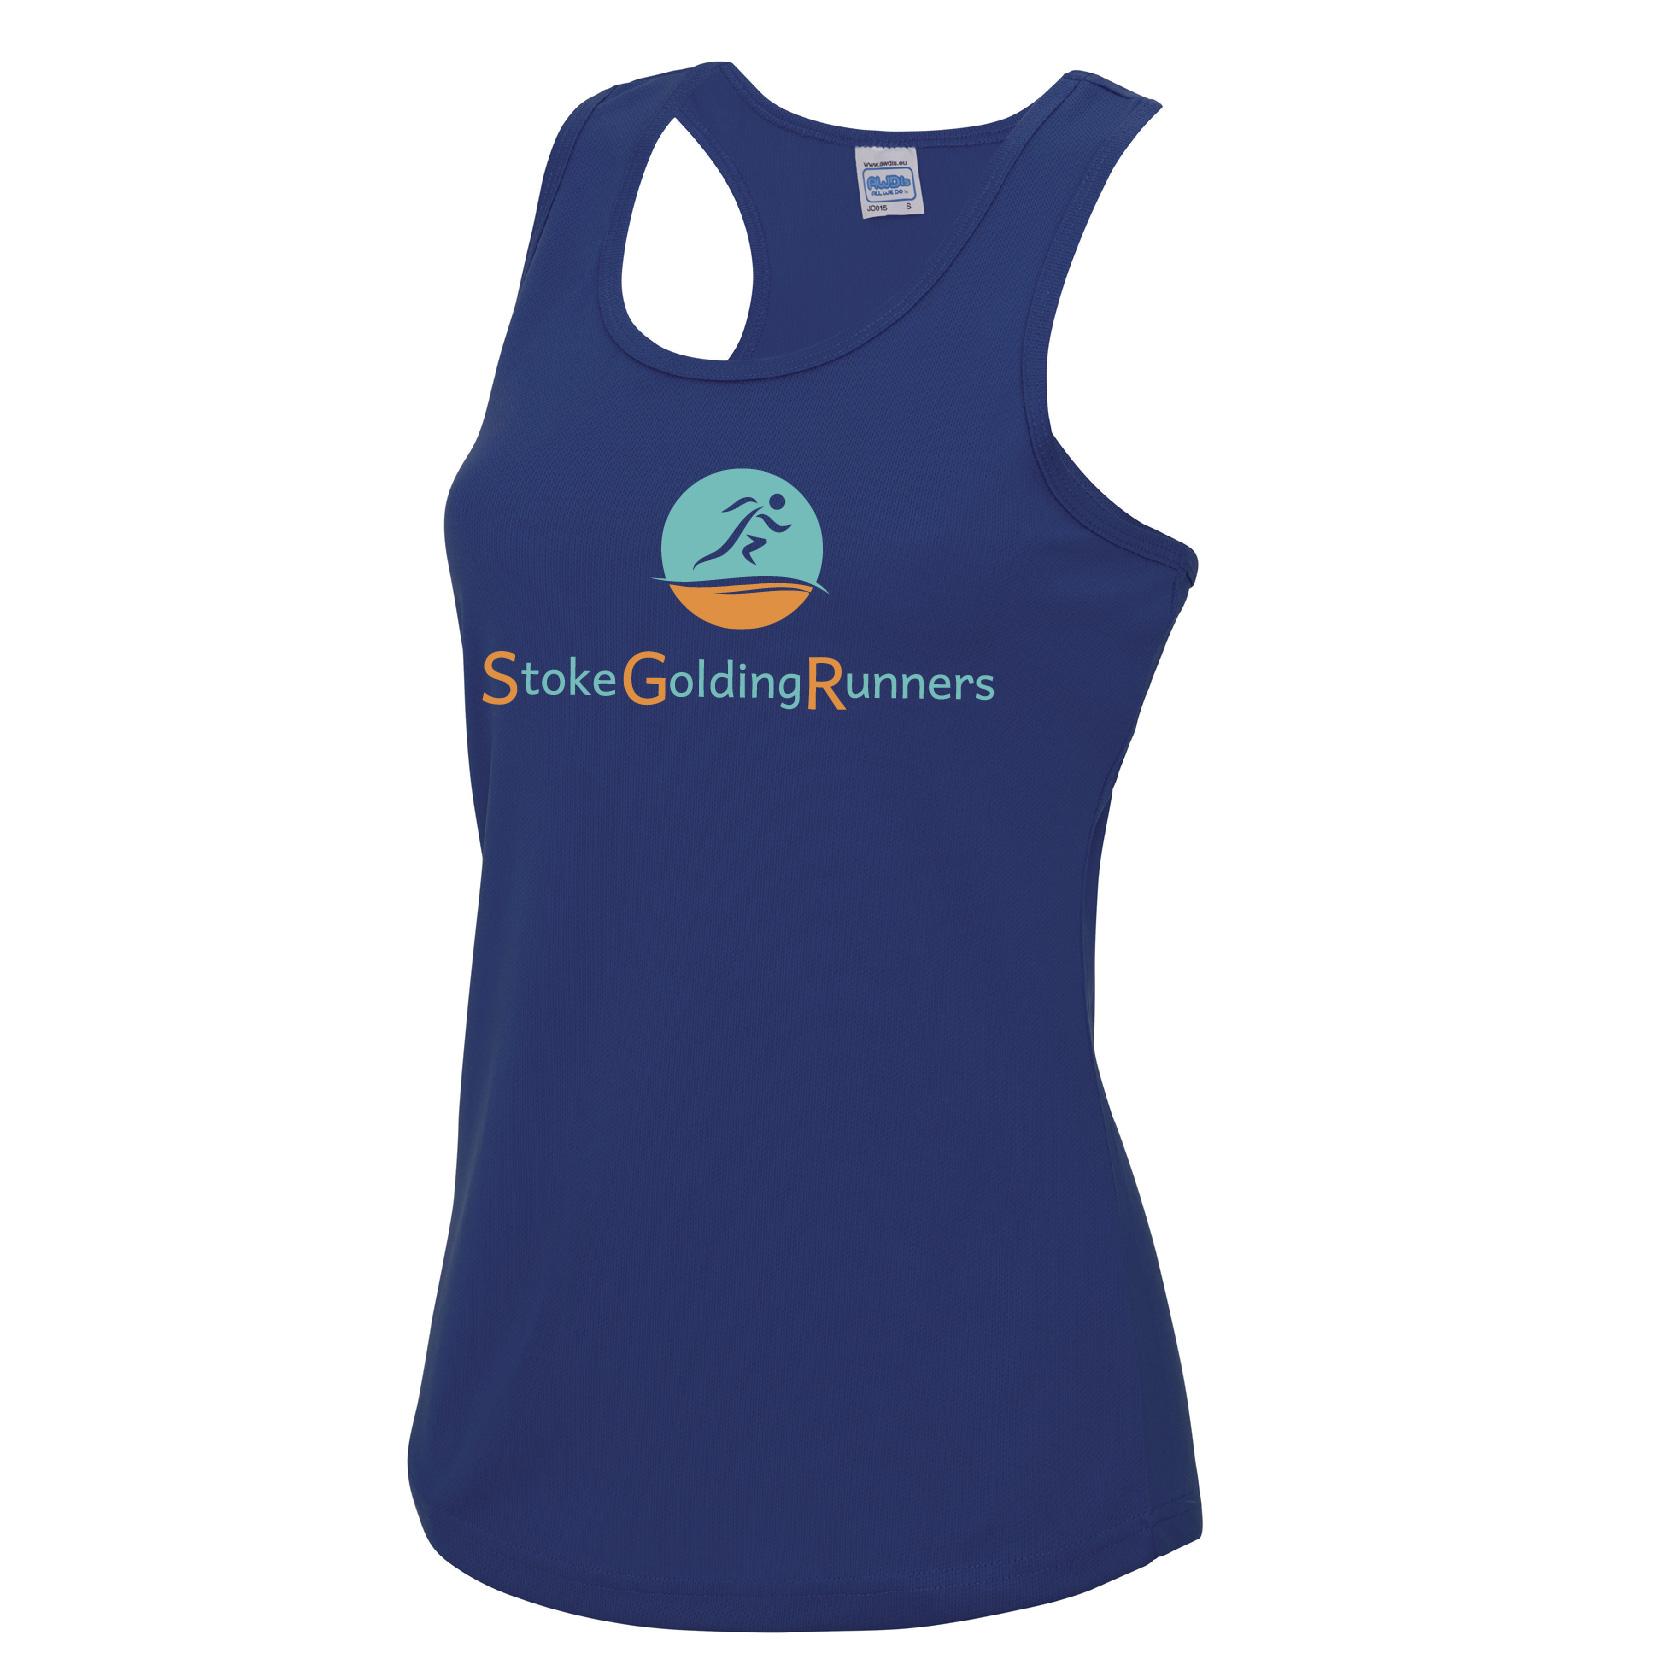 Stoke Golding Runners Club Ladies Fit Vest